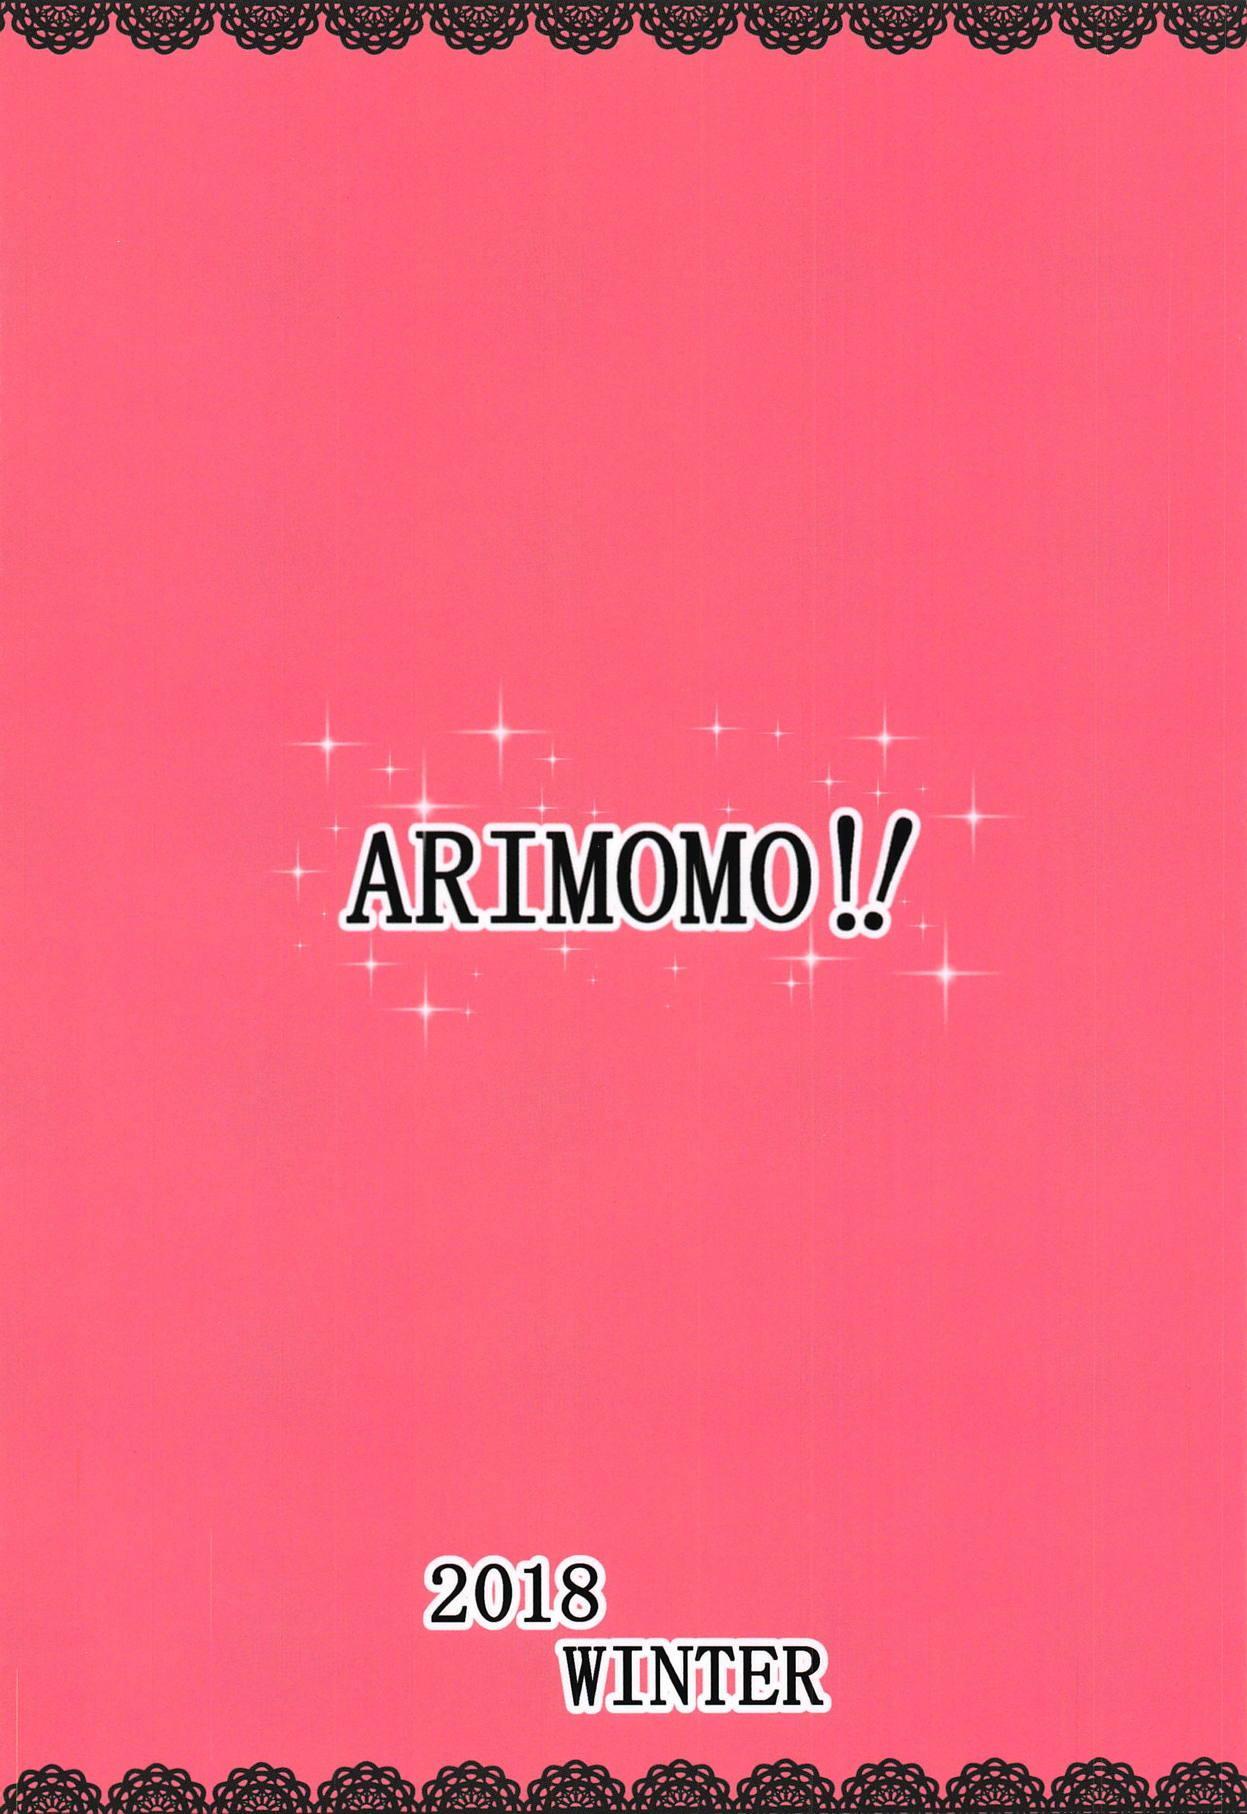 ARIMOMO!! 21